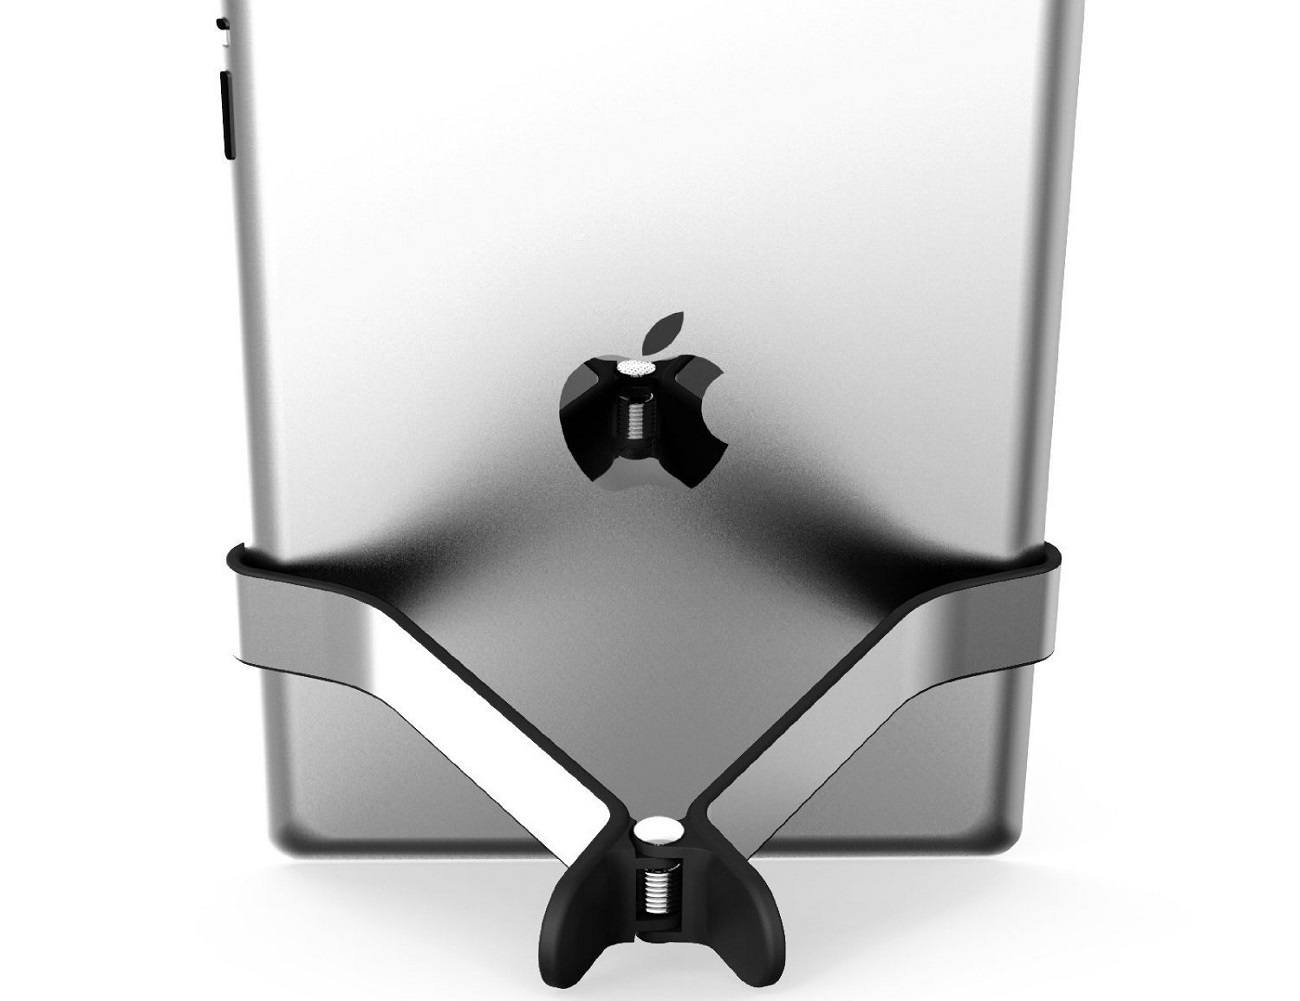 Felix+TwoHands+Tablet+Travel+Stand